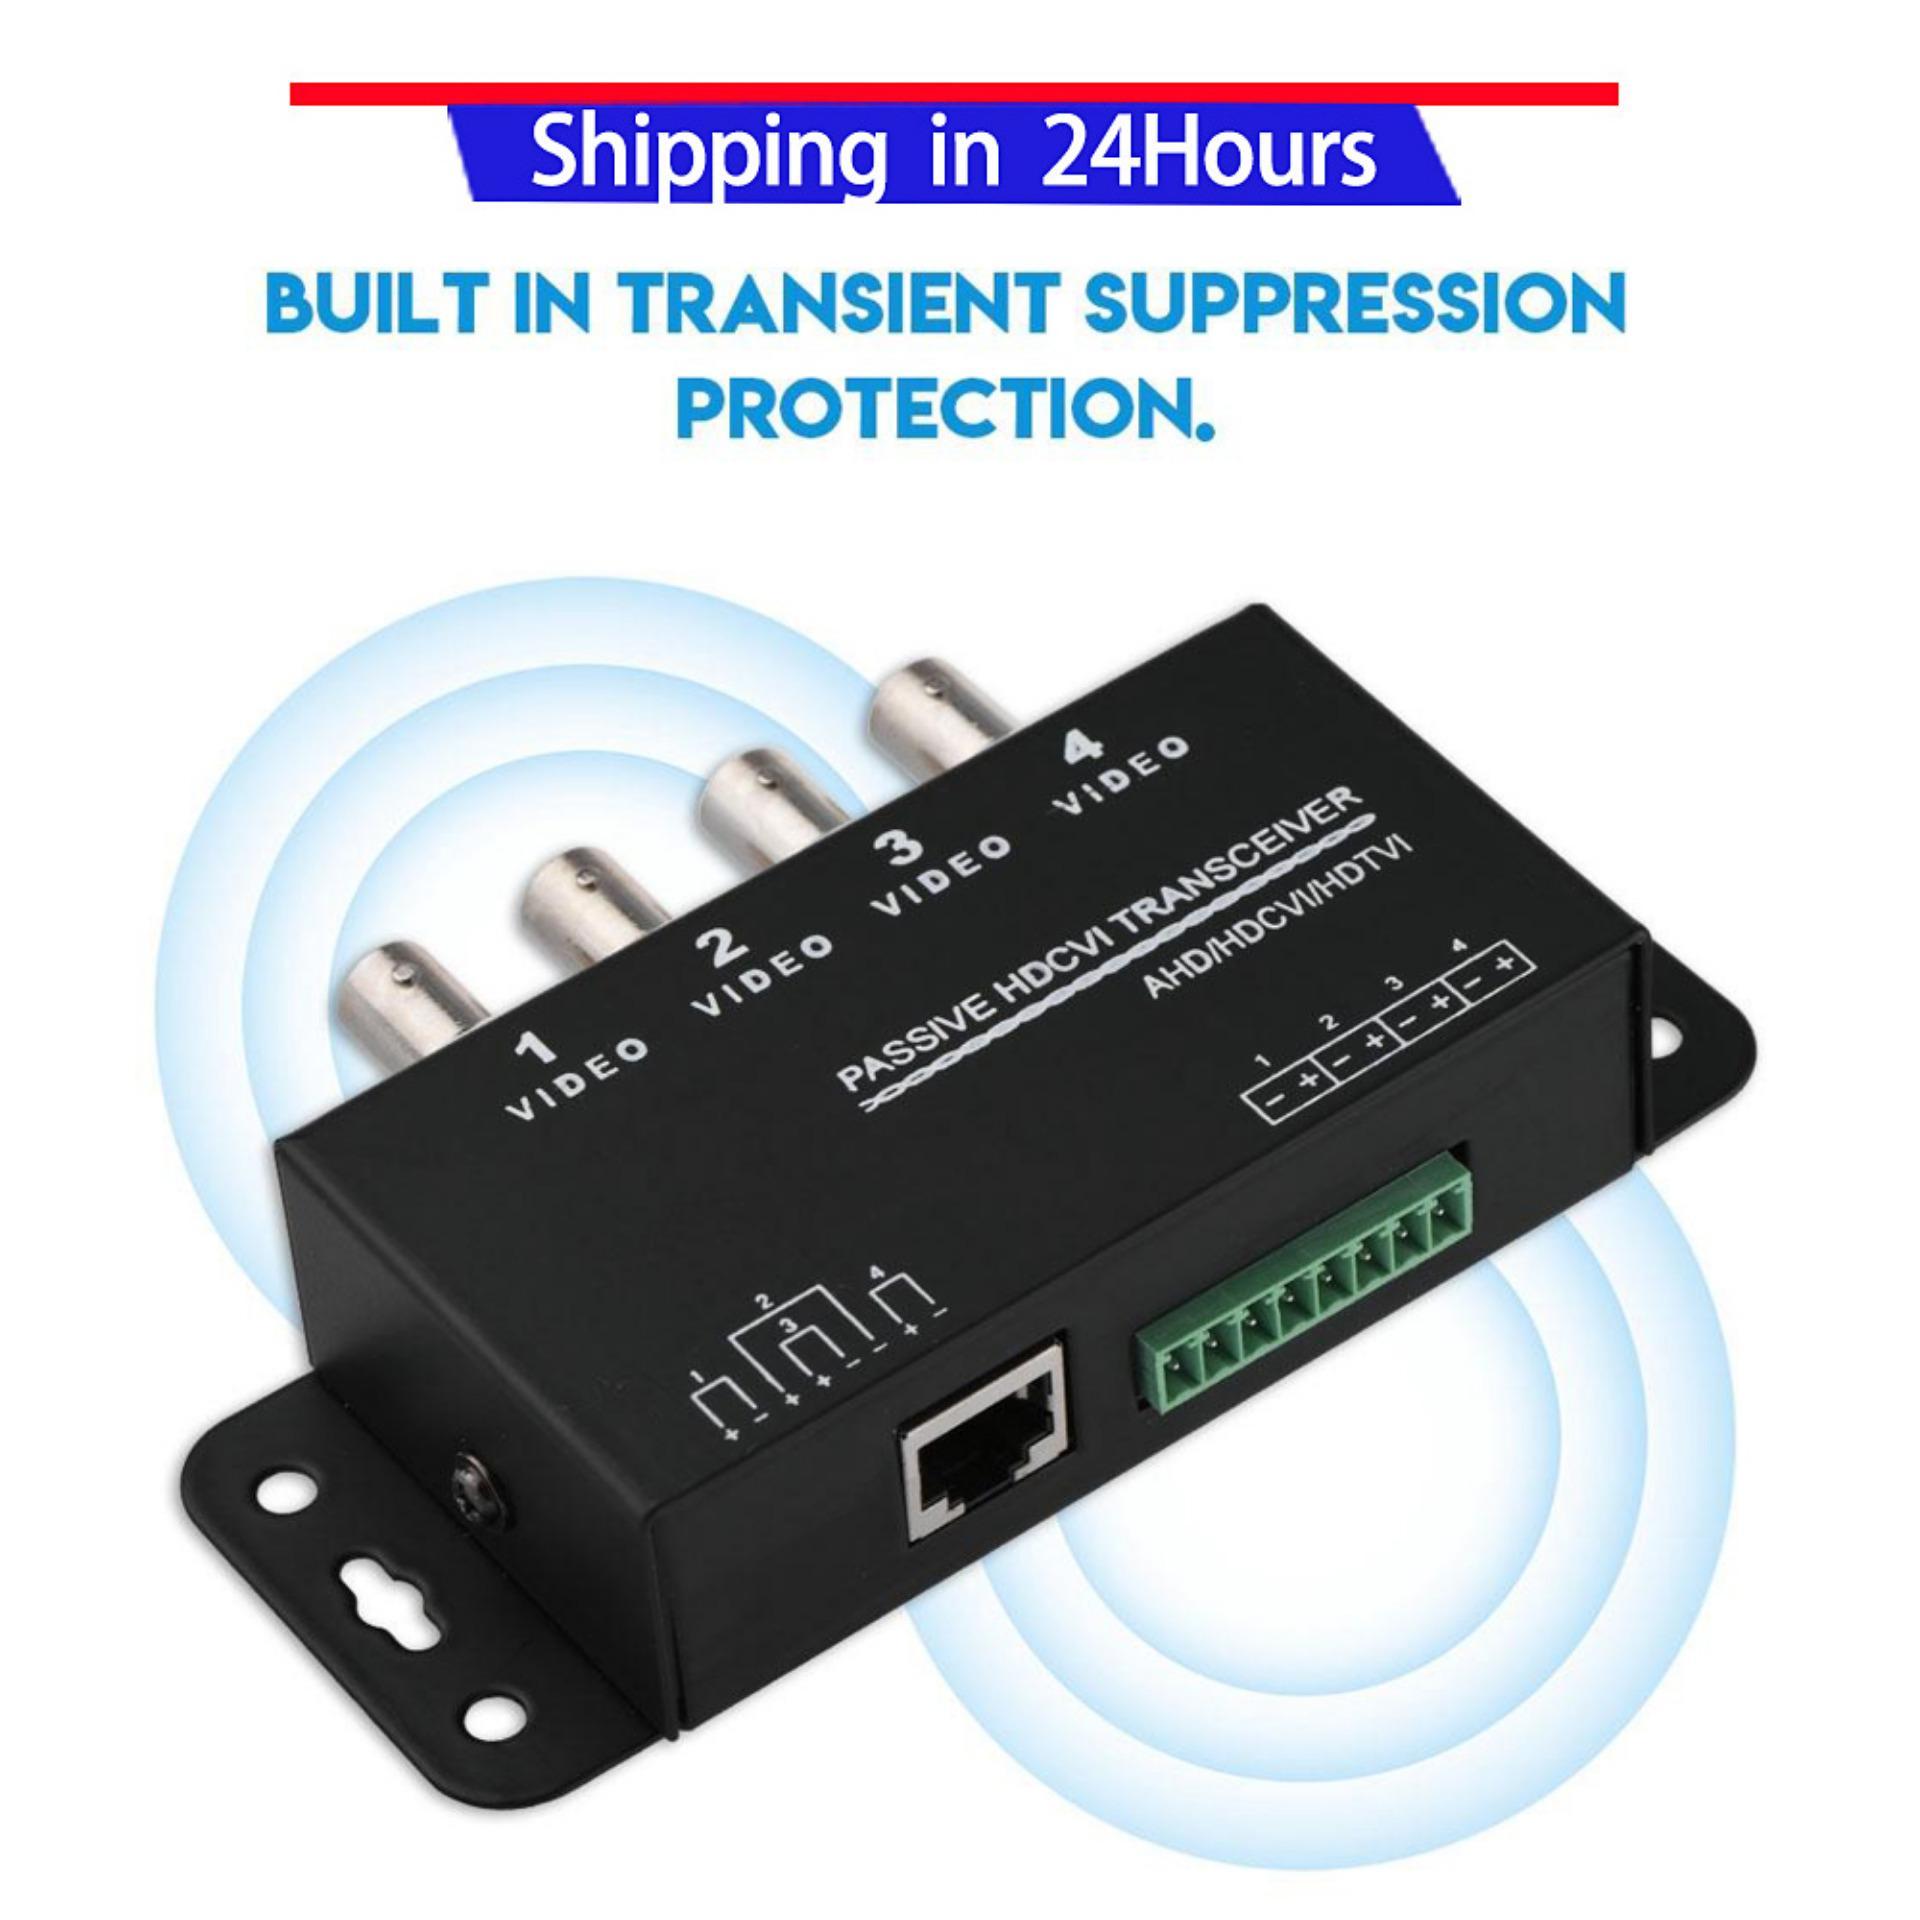 Video Transceiver BNC to RJ45 CAT5/6 UTP Passive Transceiver Video Balun for AHD/HDCVI/HDTVI CCTV Camera 4-CH - intl